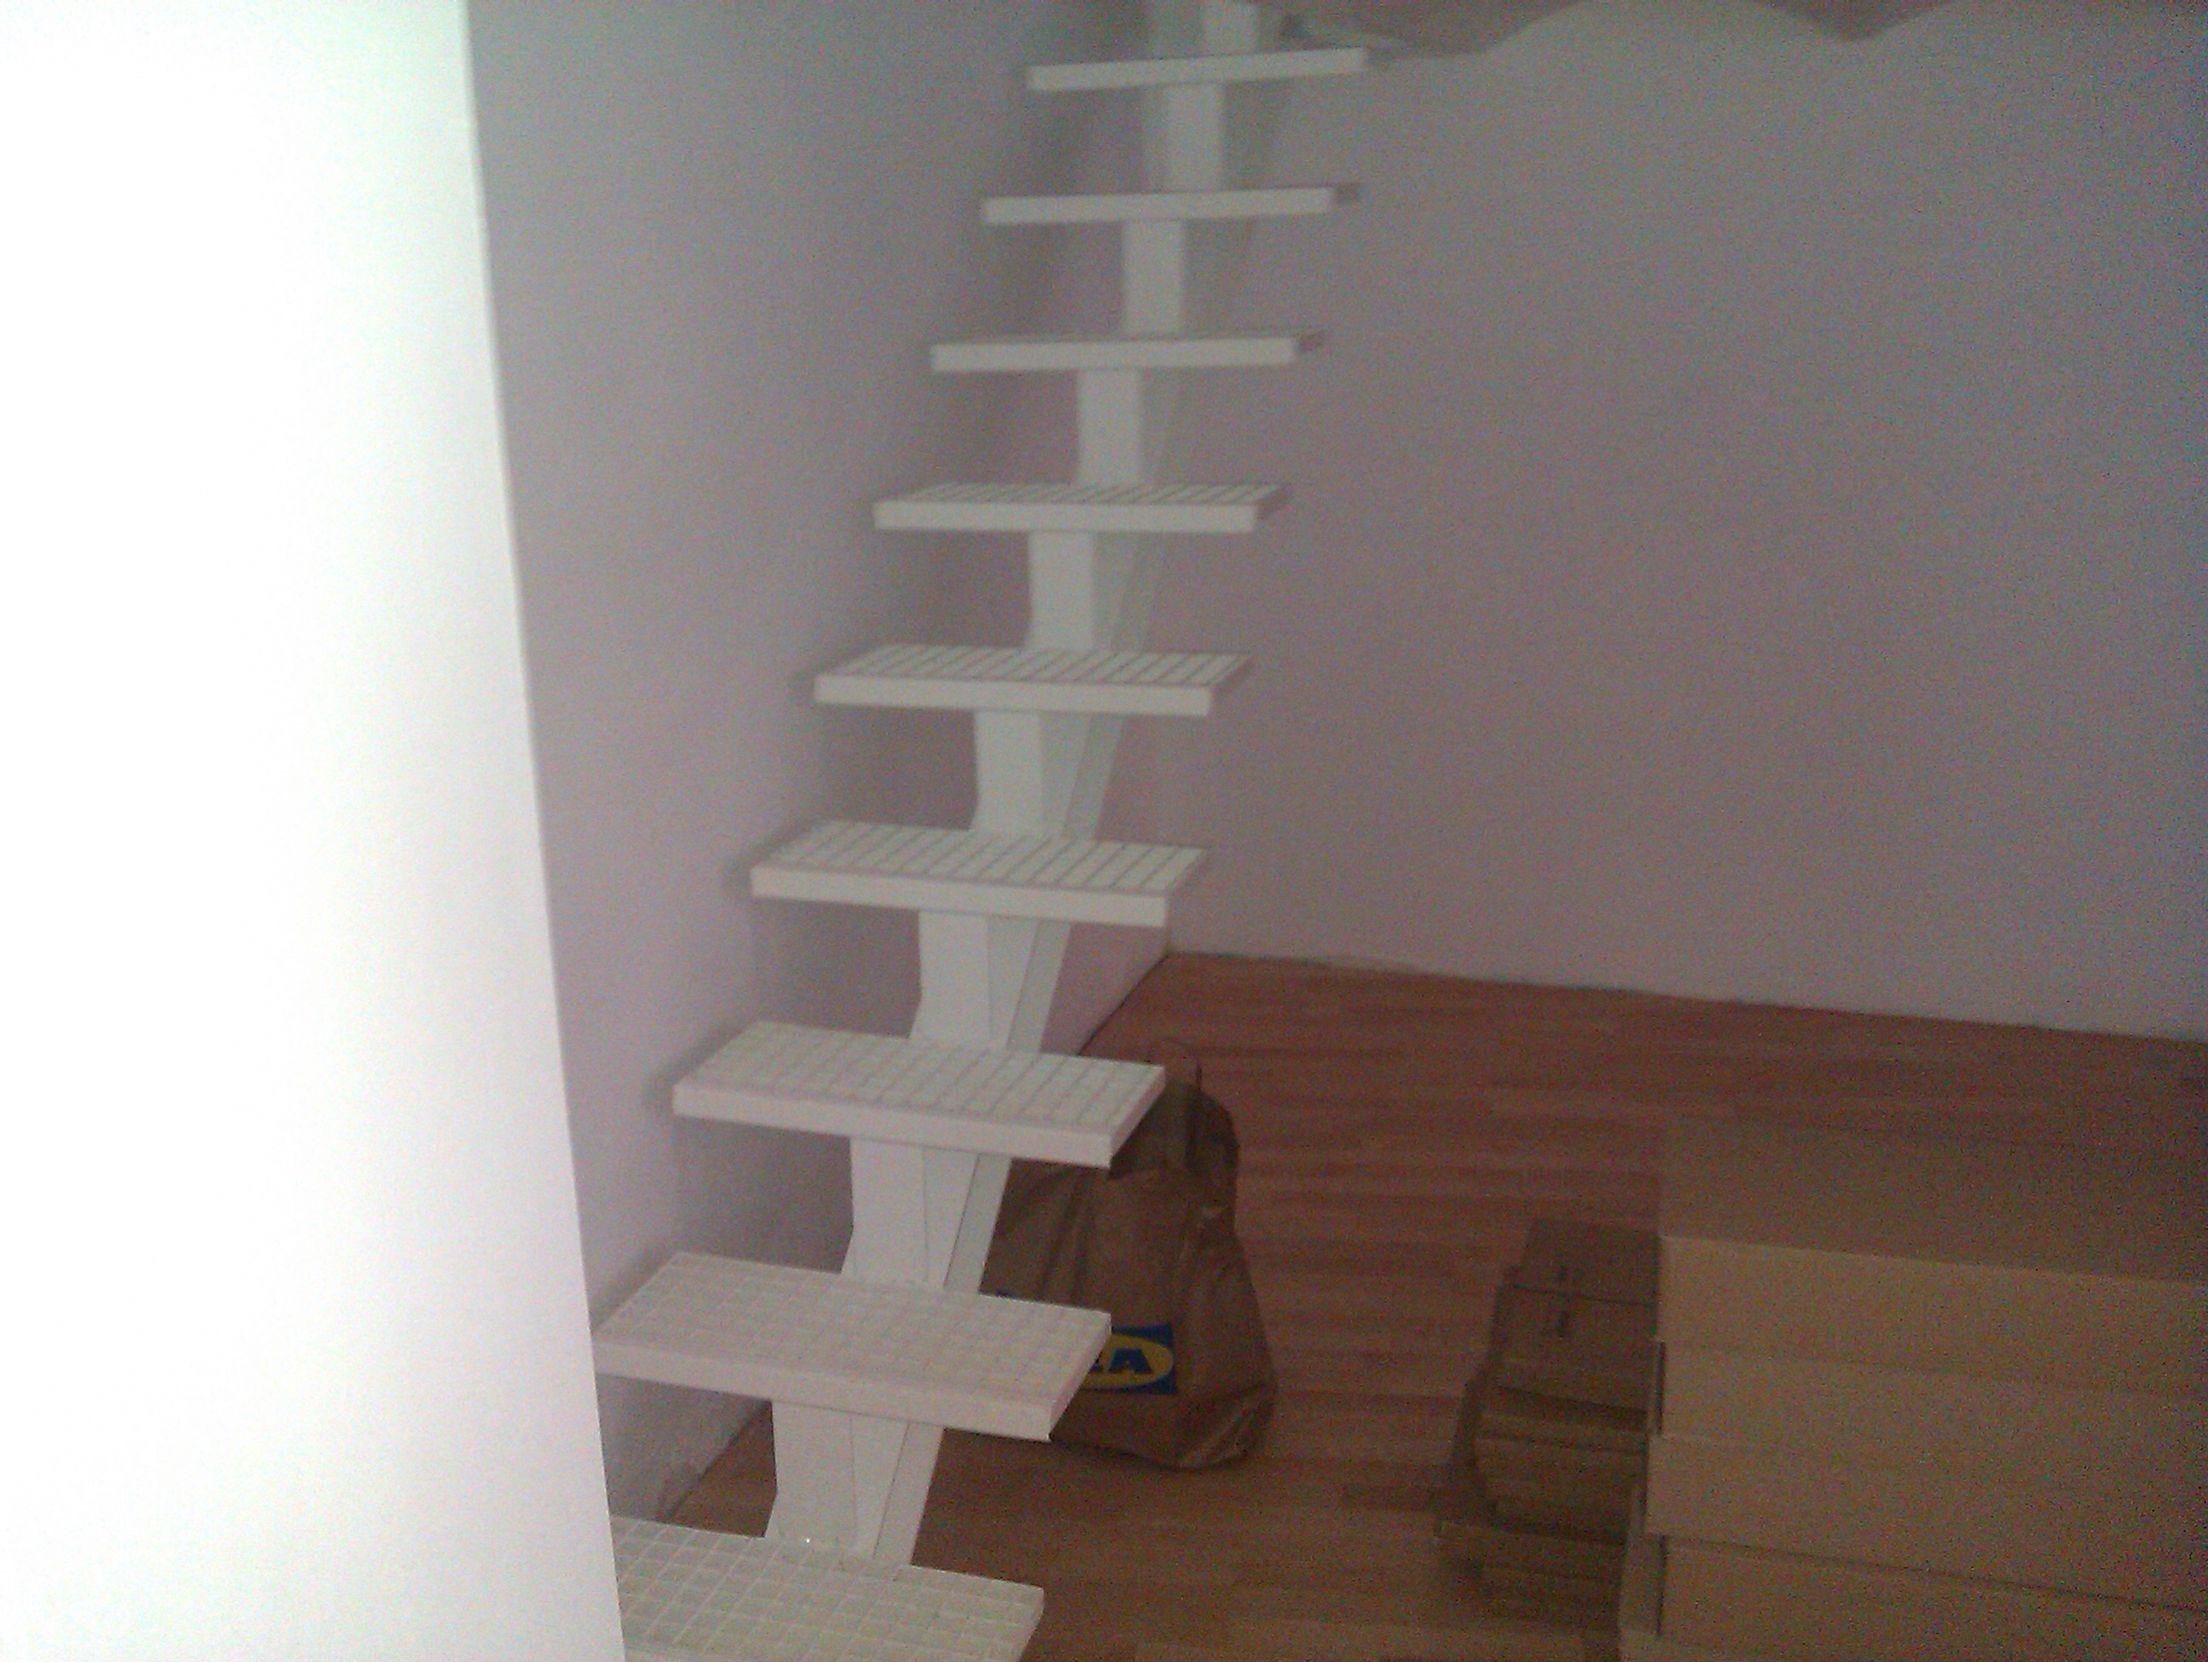 Escalera viga central con pelda o de tramex azerometal - Escaleras para sotanos ...